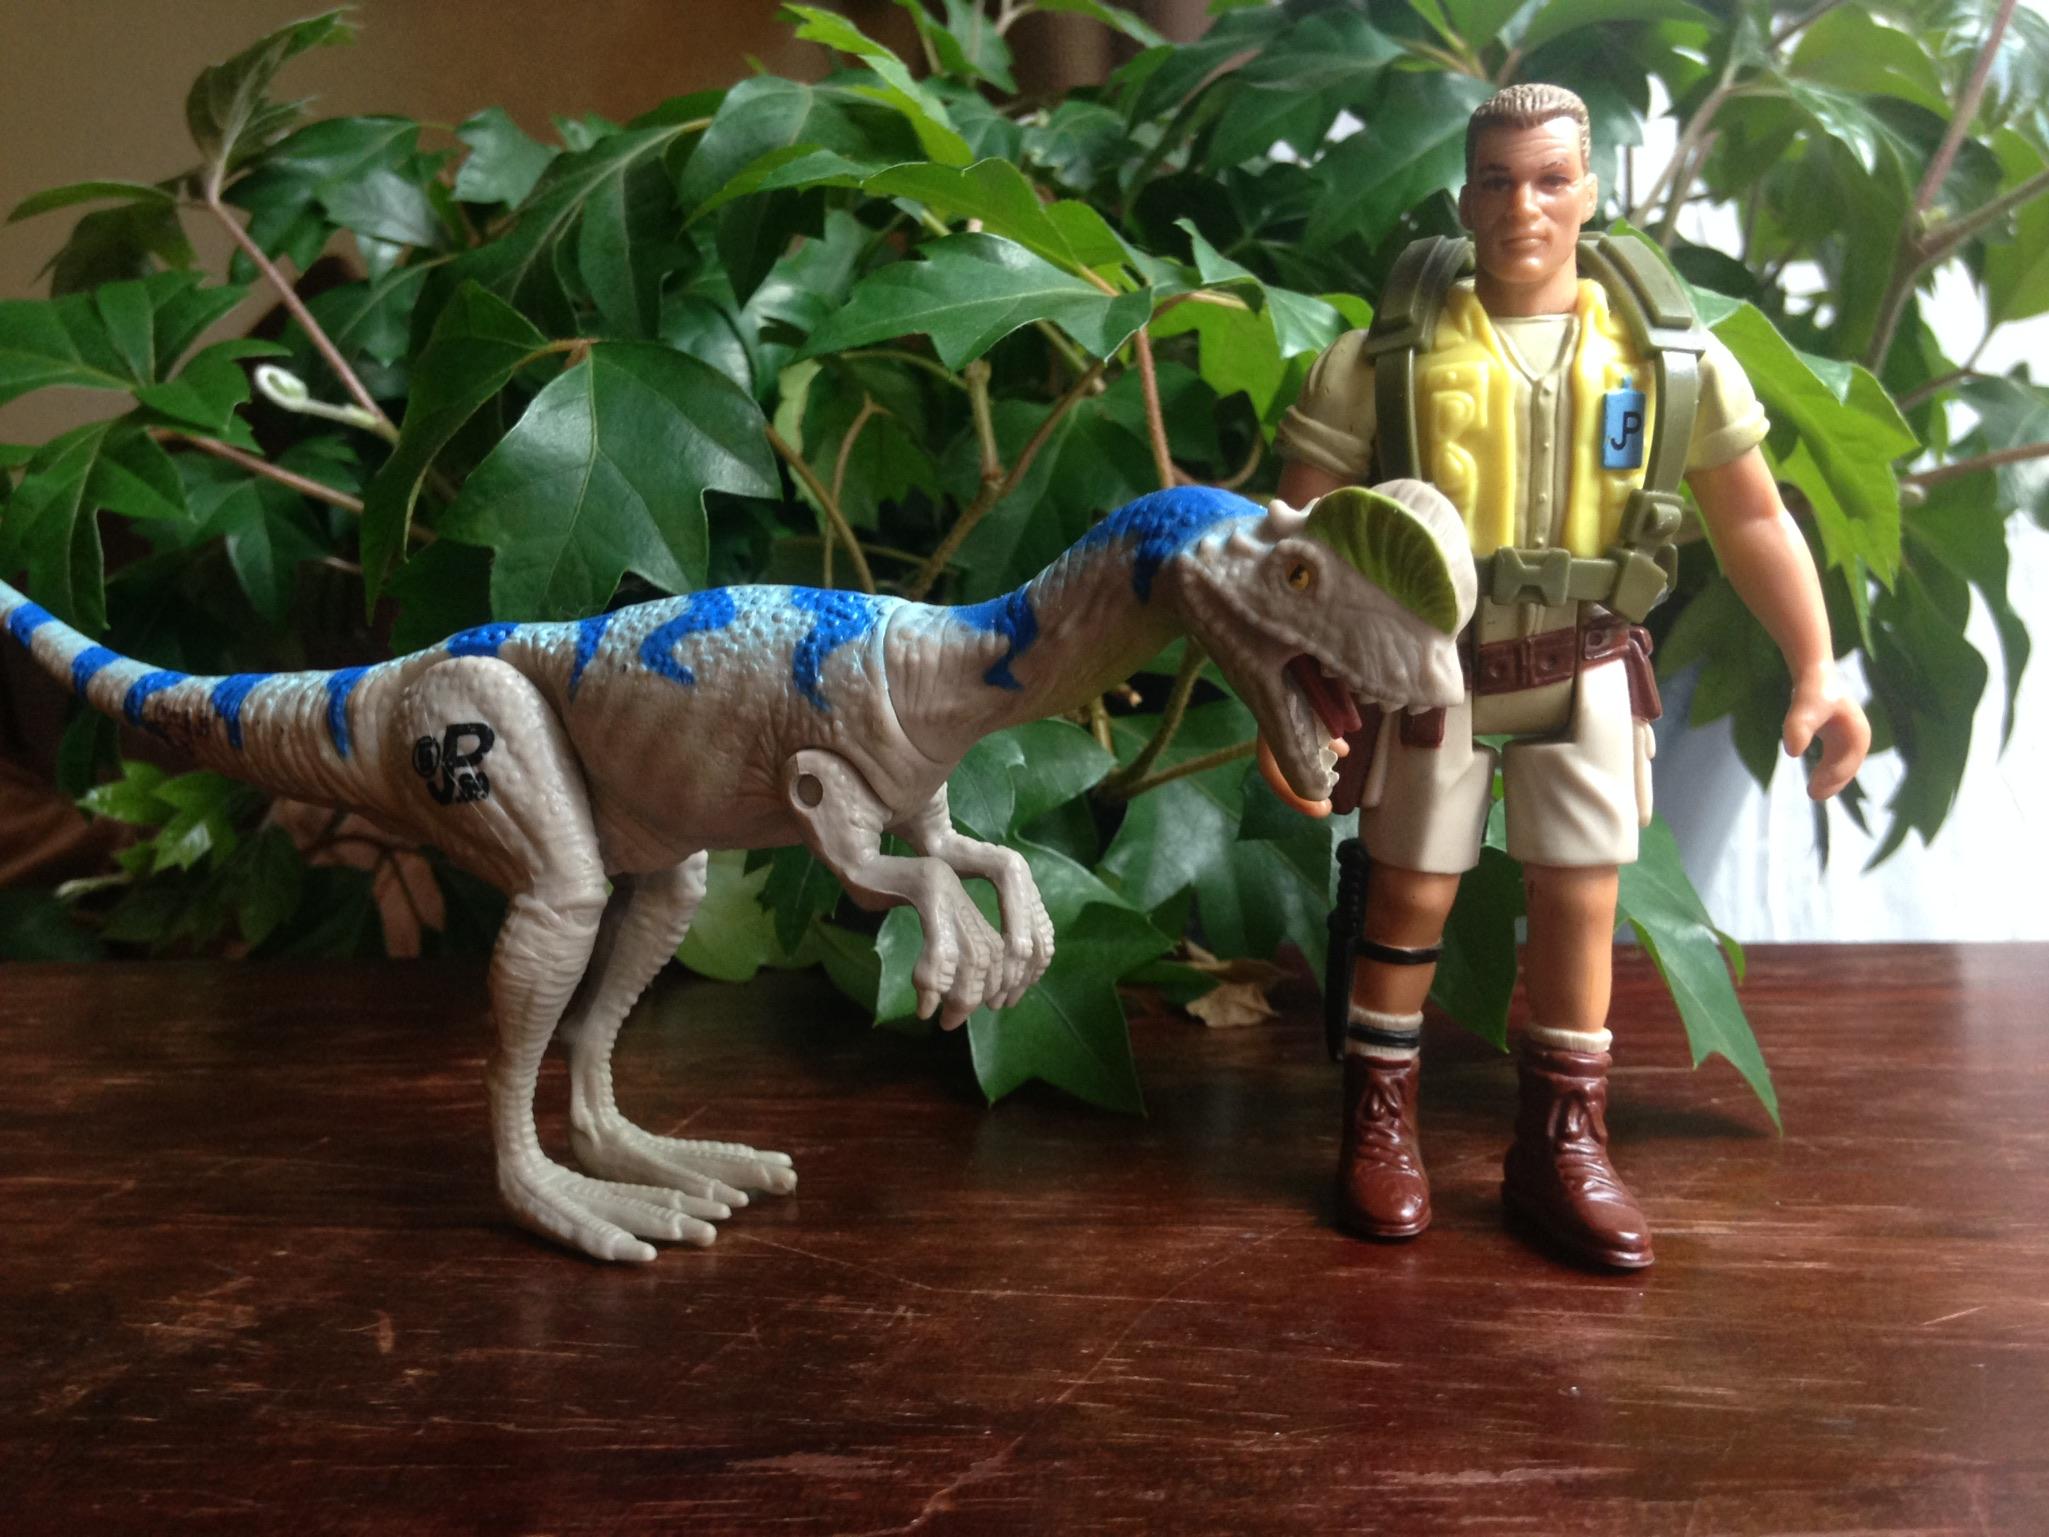 A Dilophosaurus and Muldoon - $2